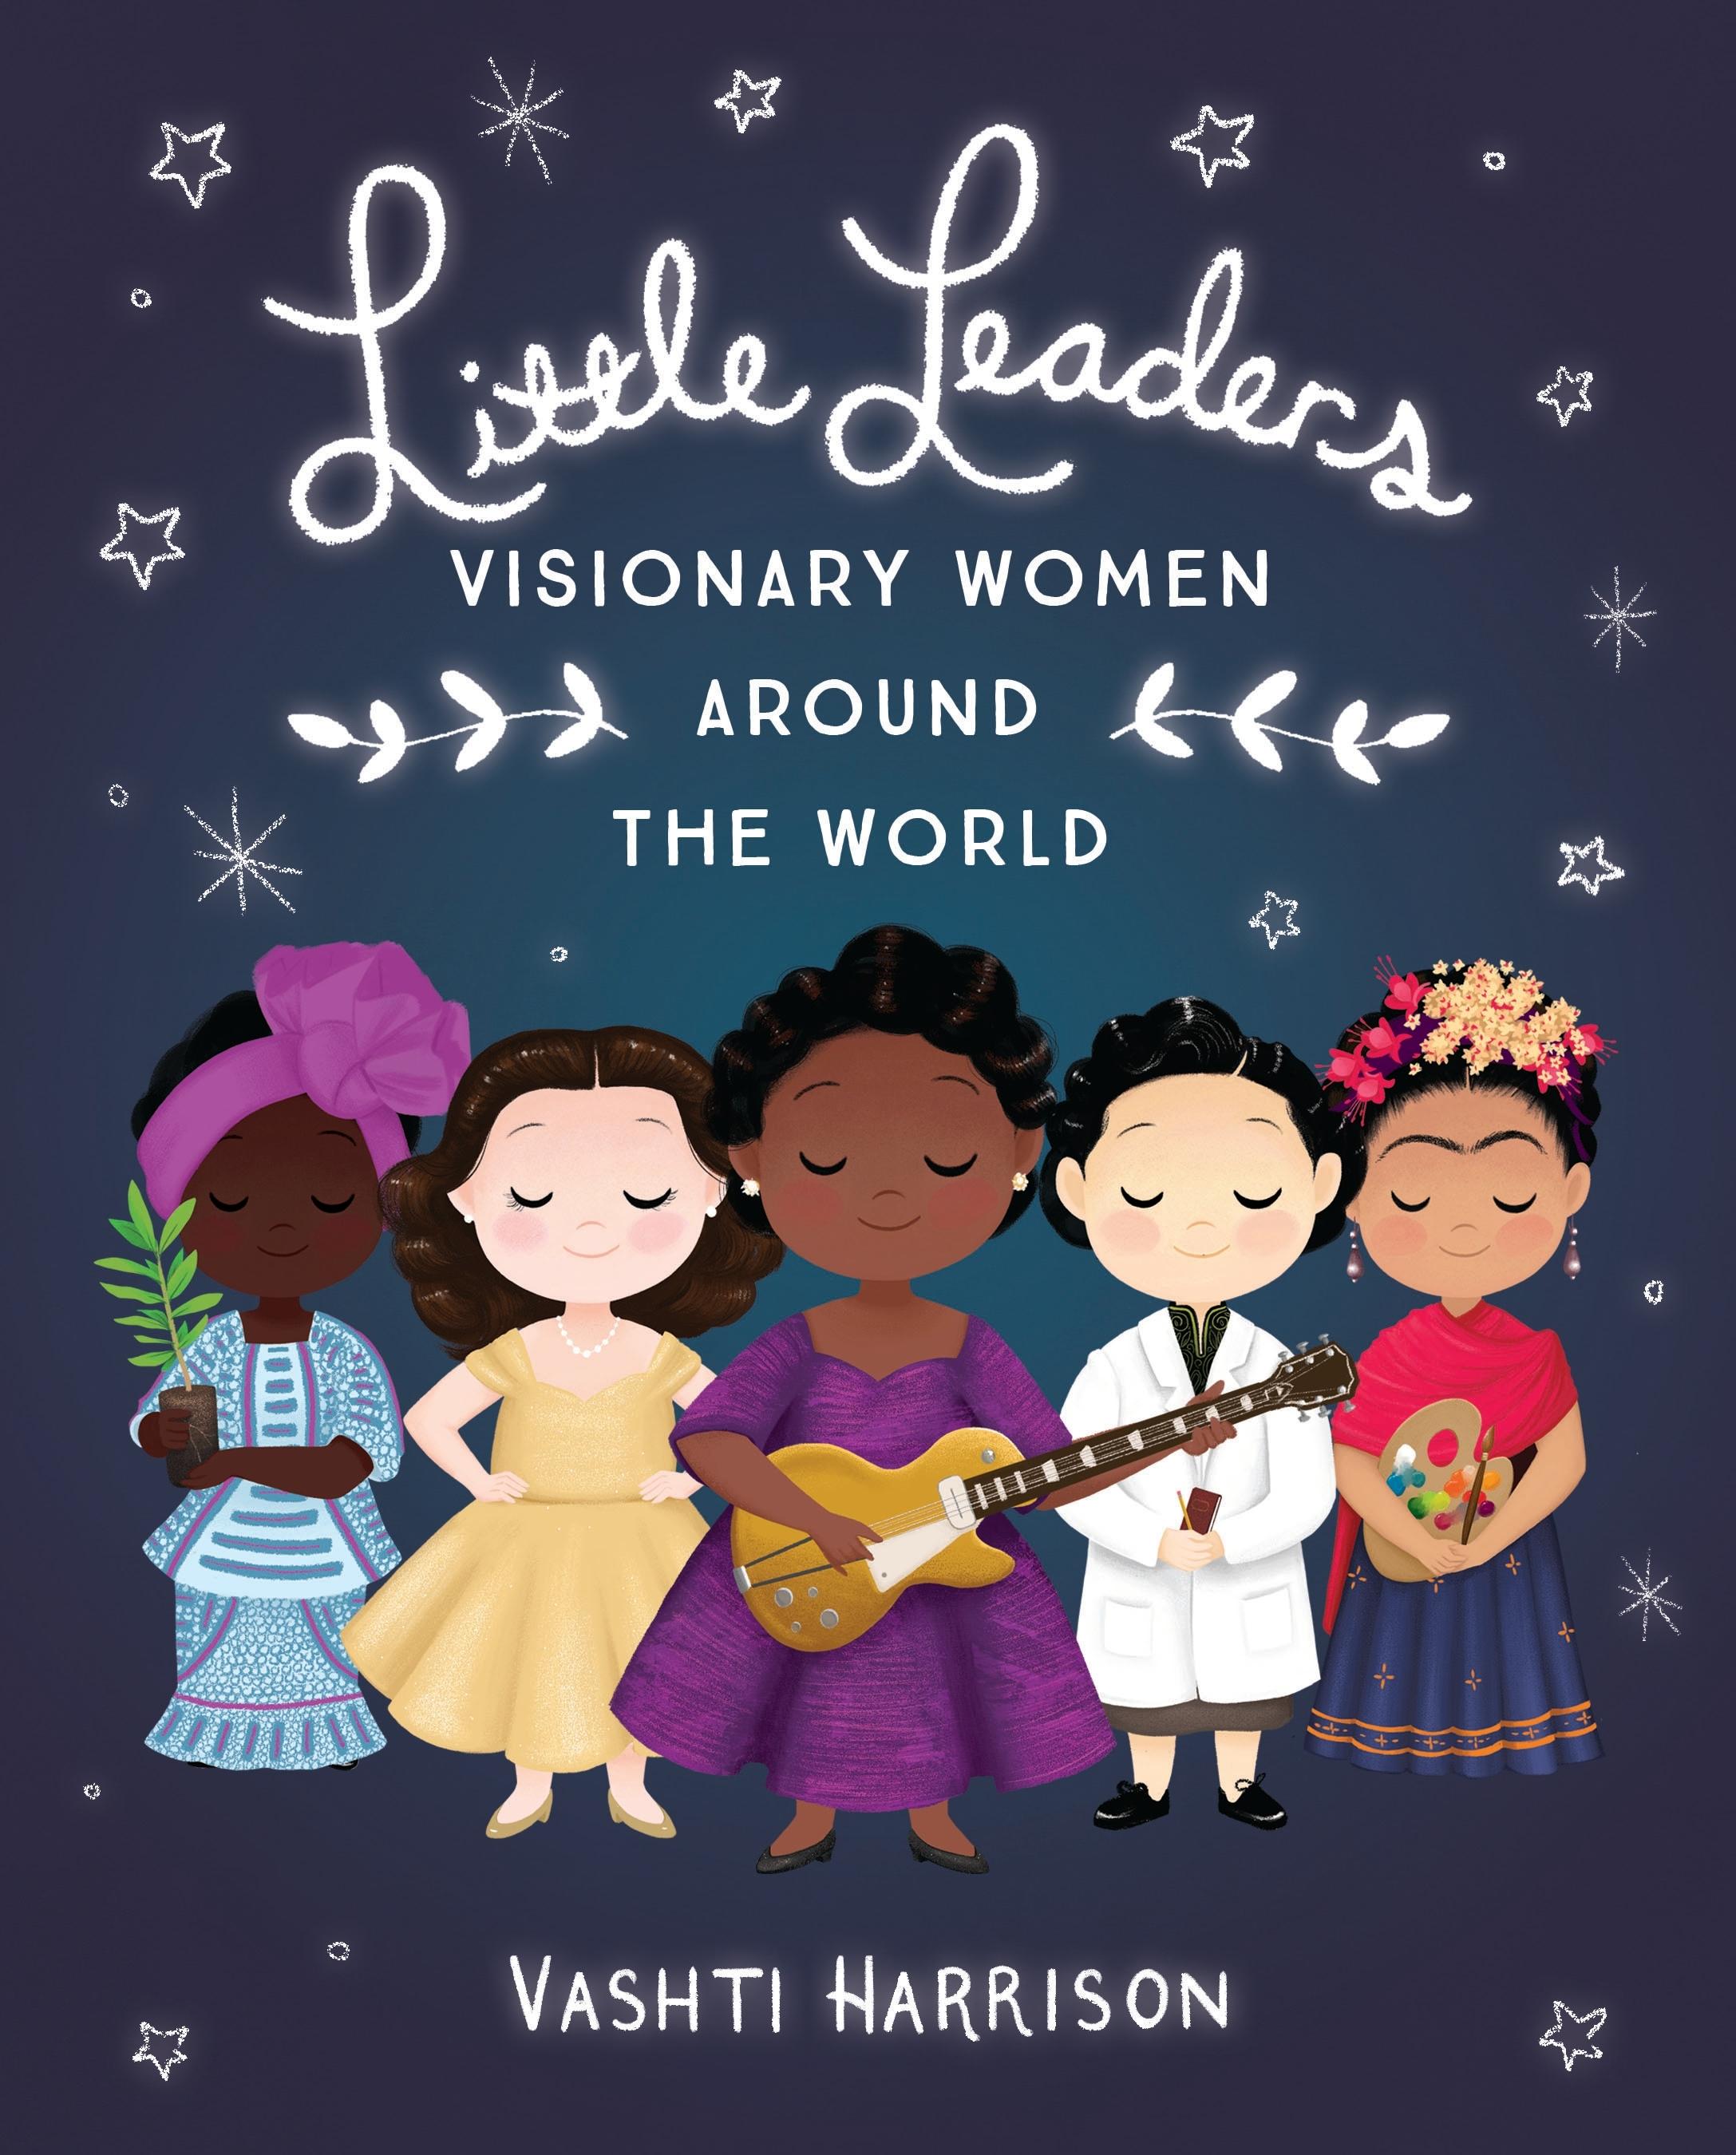 harrison-little-leaders-visionary-women.jpg